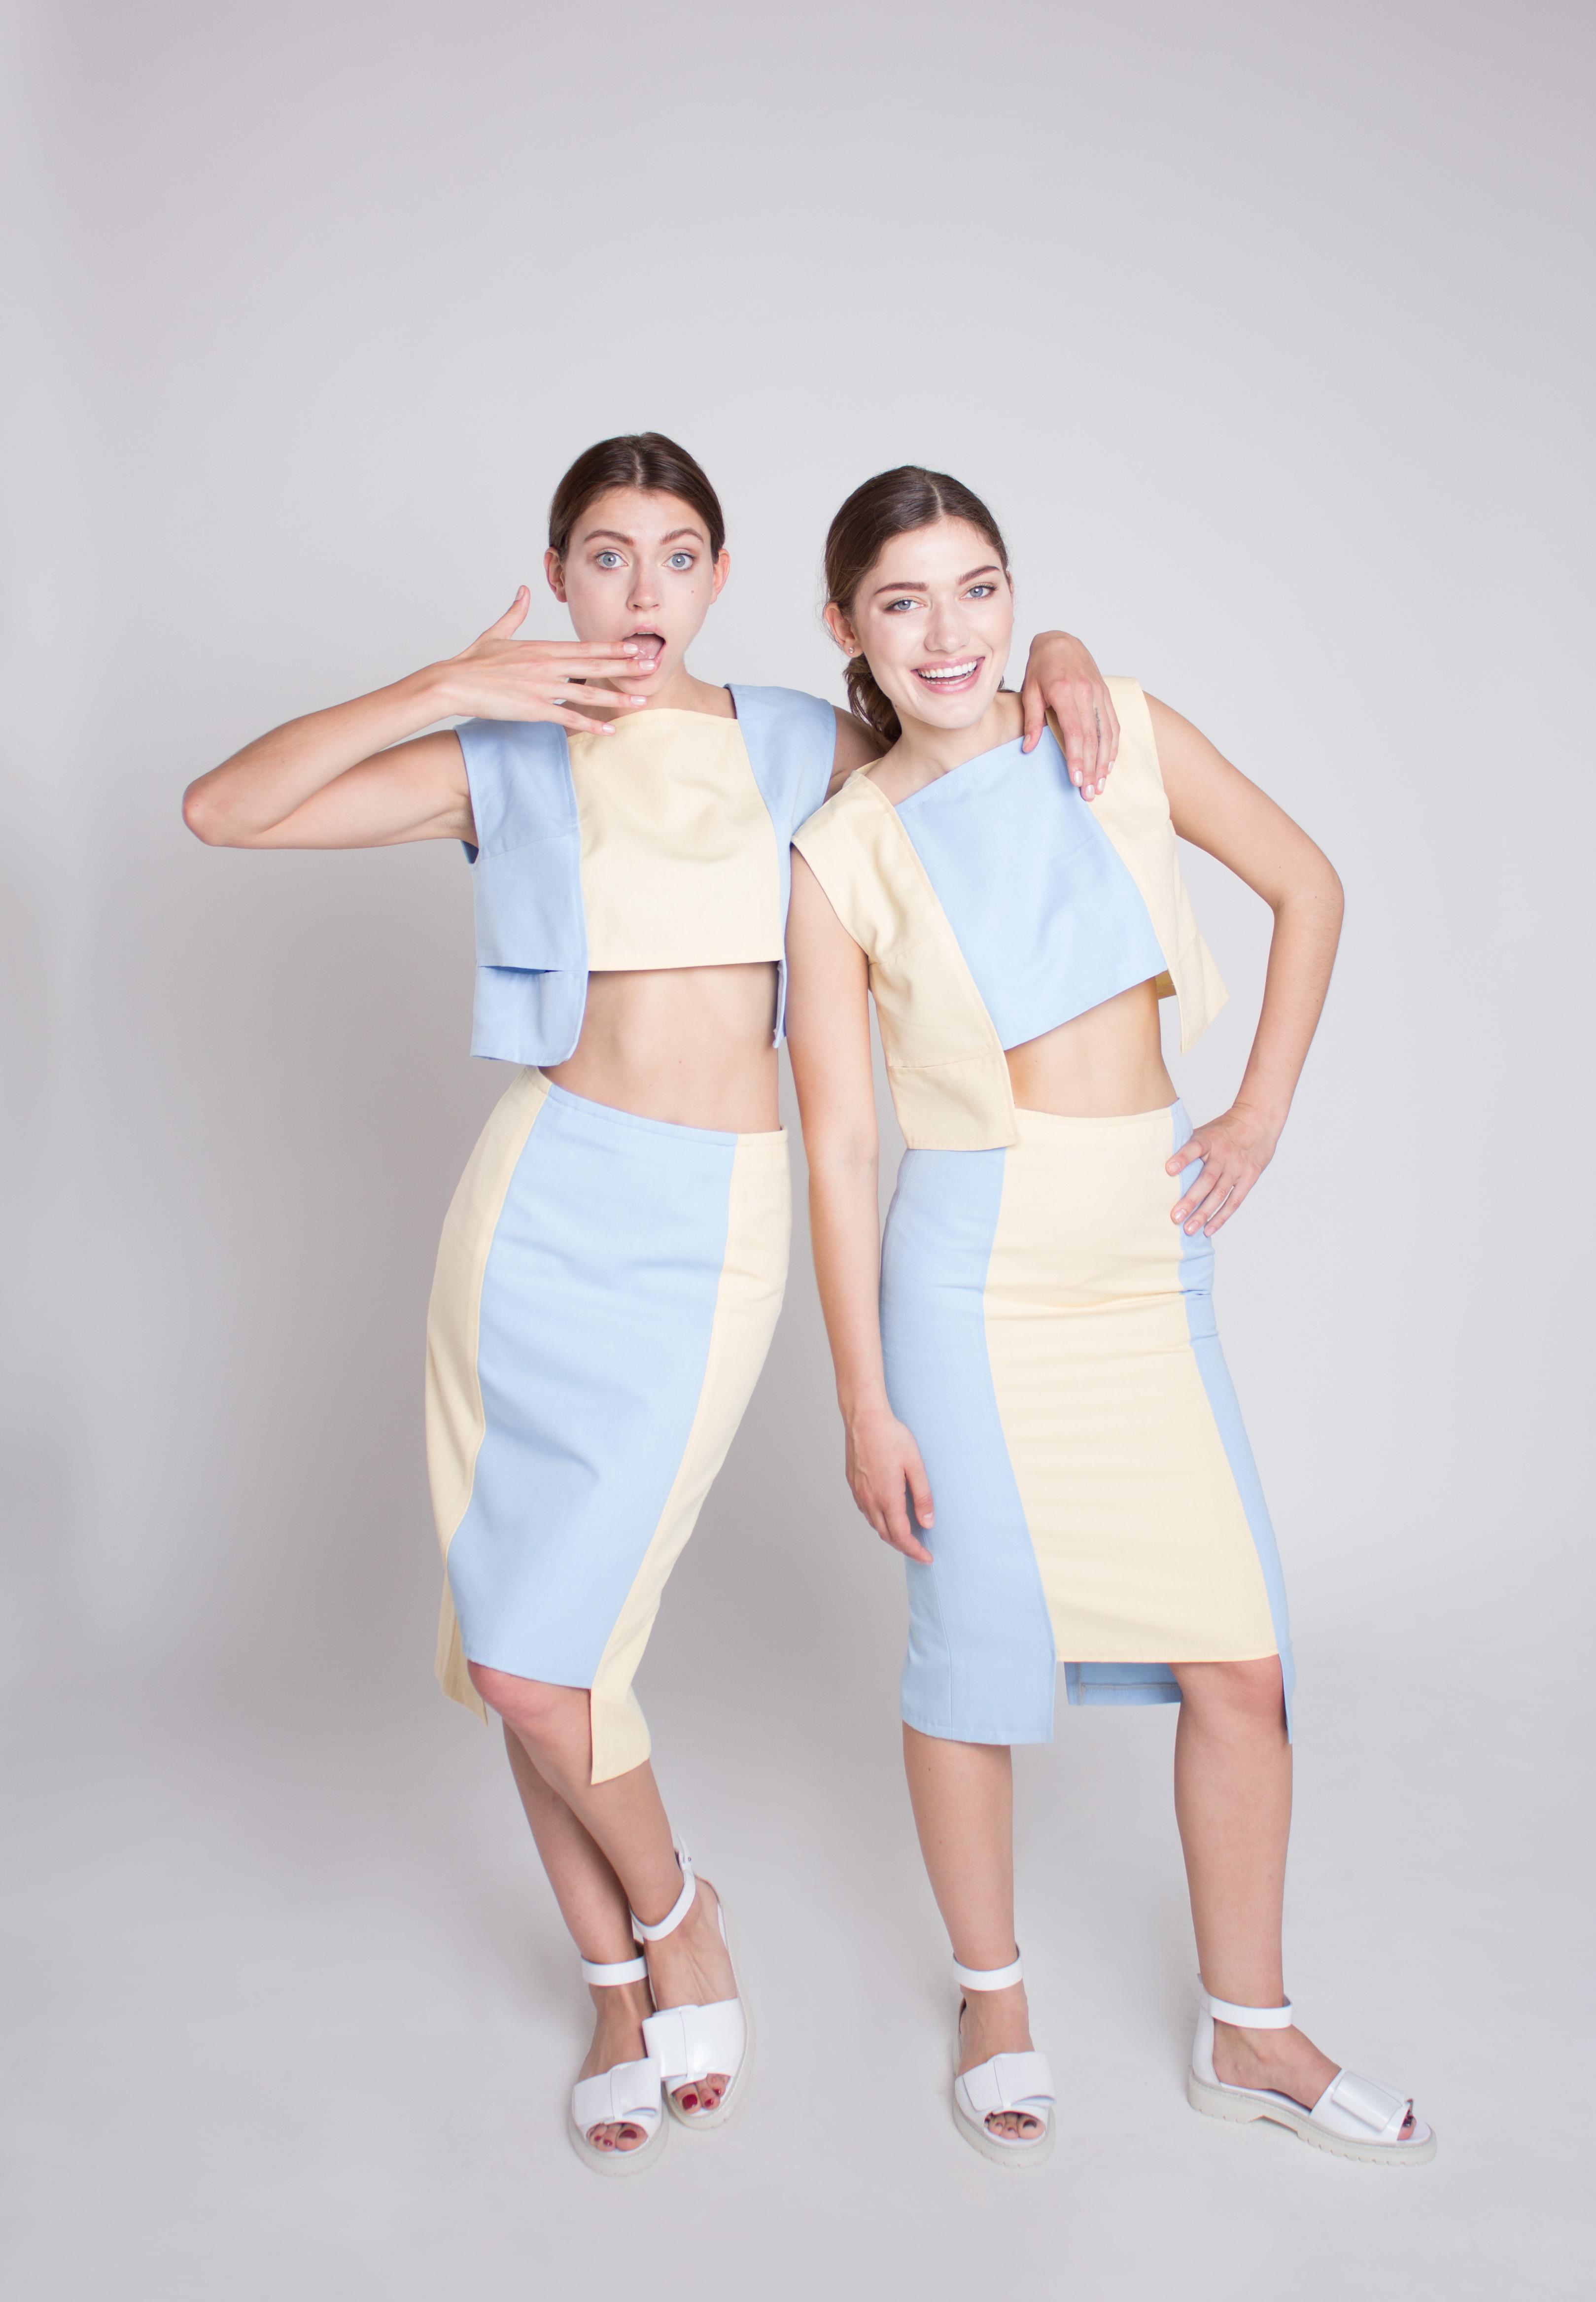 Молодой украинский бренд The Skin представил lookbook дебютной коллекции